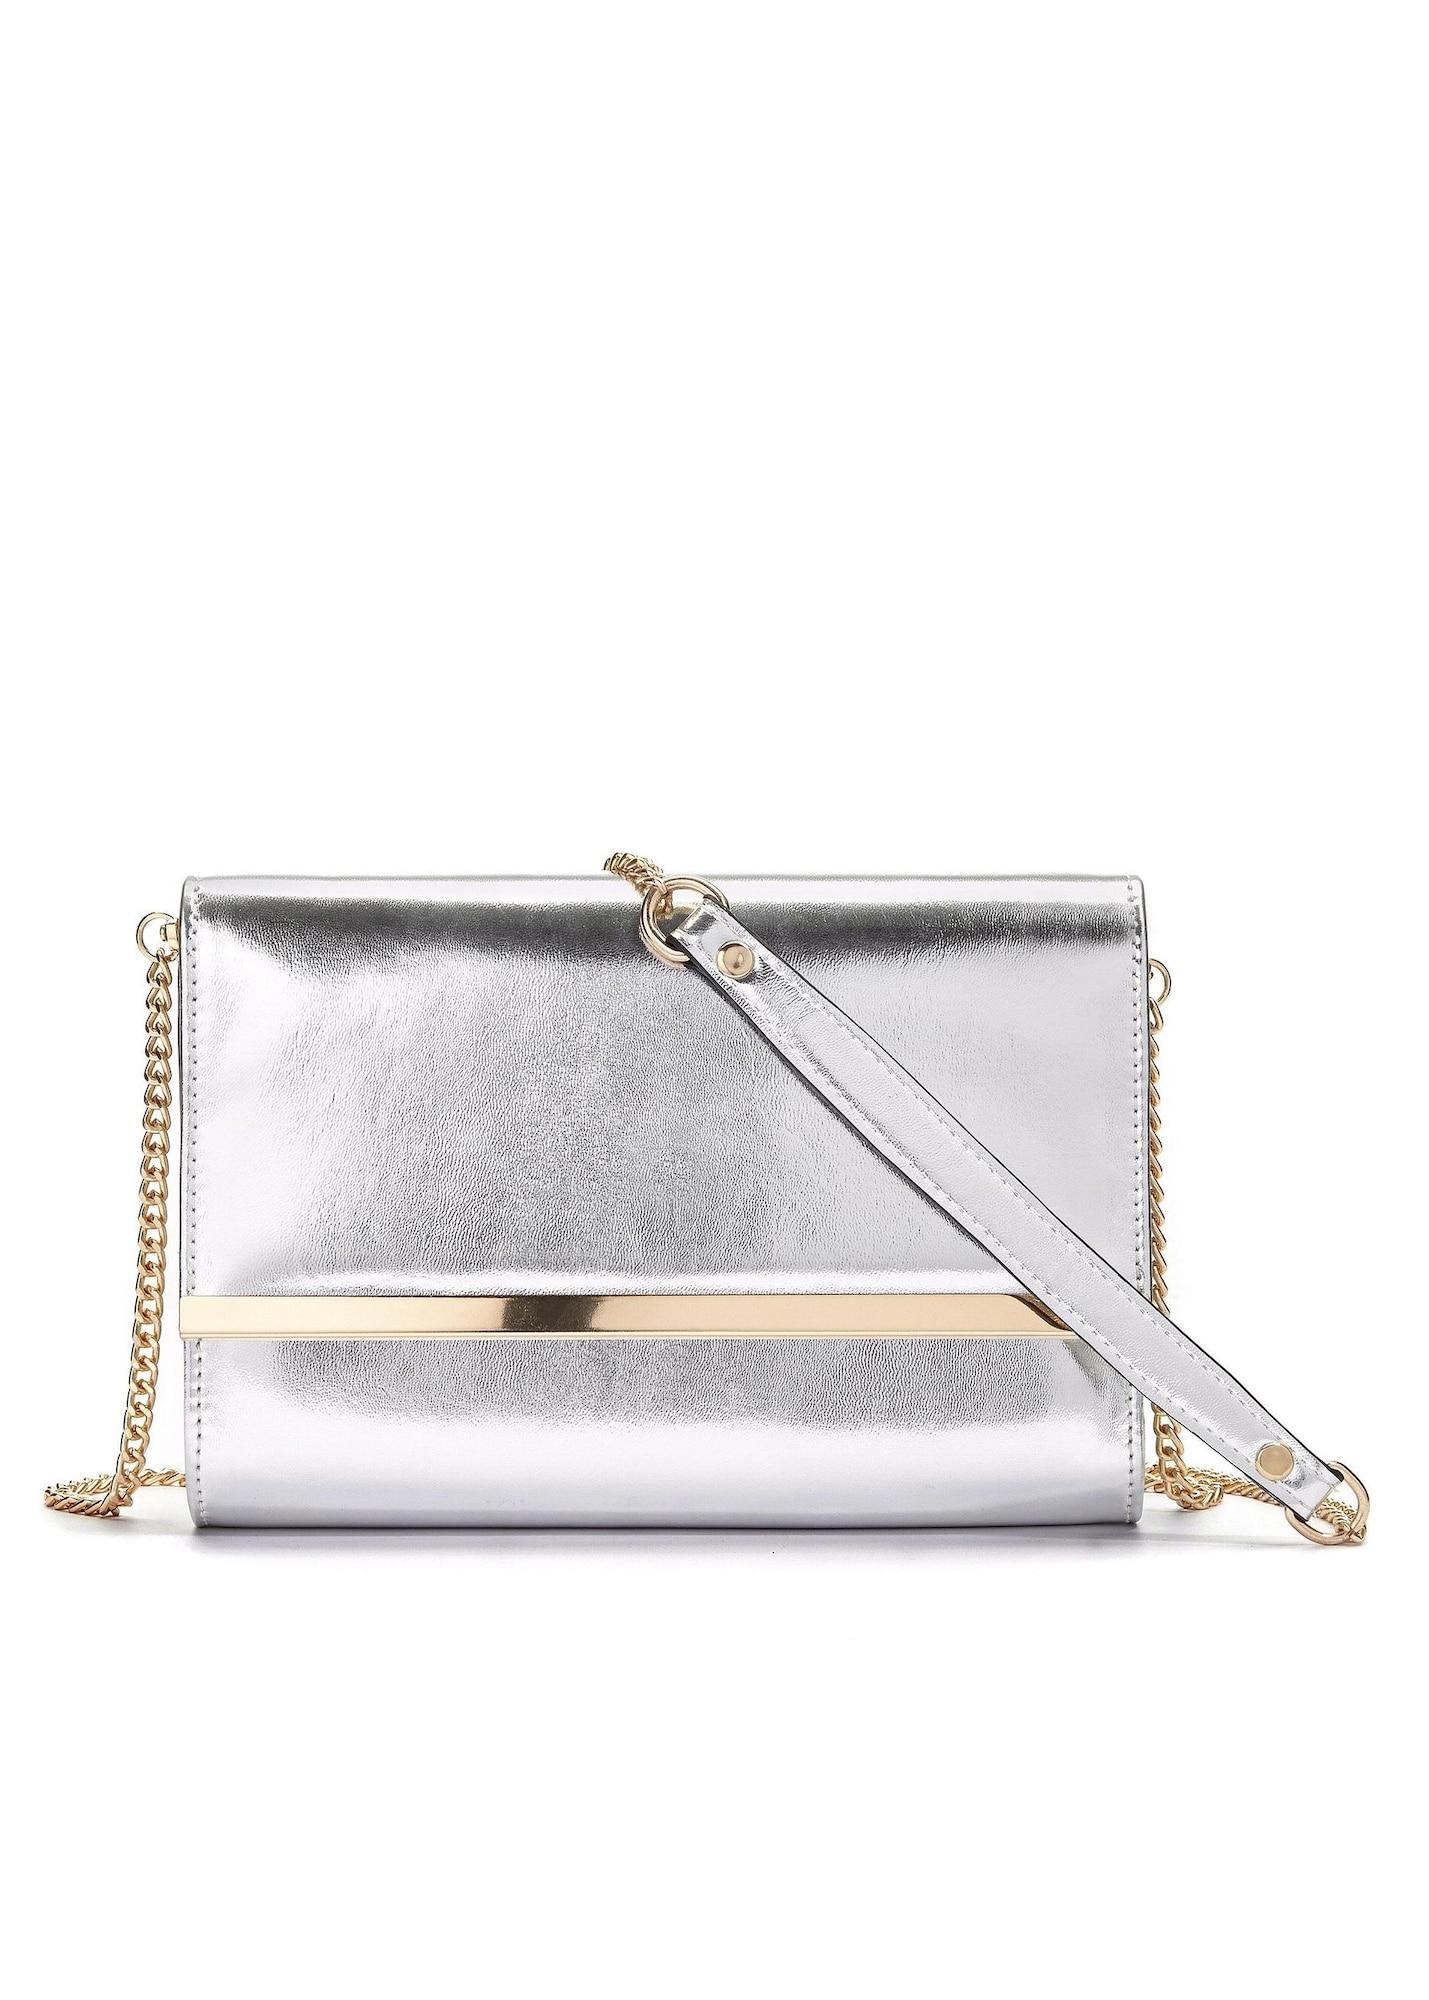 Abendtasche | Taschen > Handtaschen > Abendtaschen | Gold - Silber | Lascana